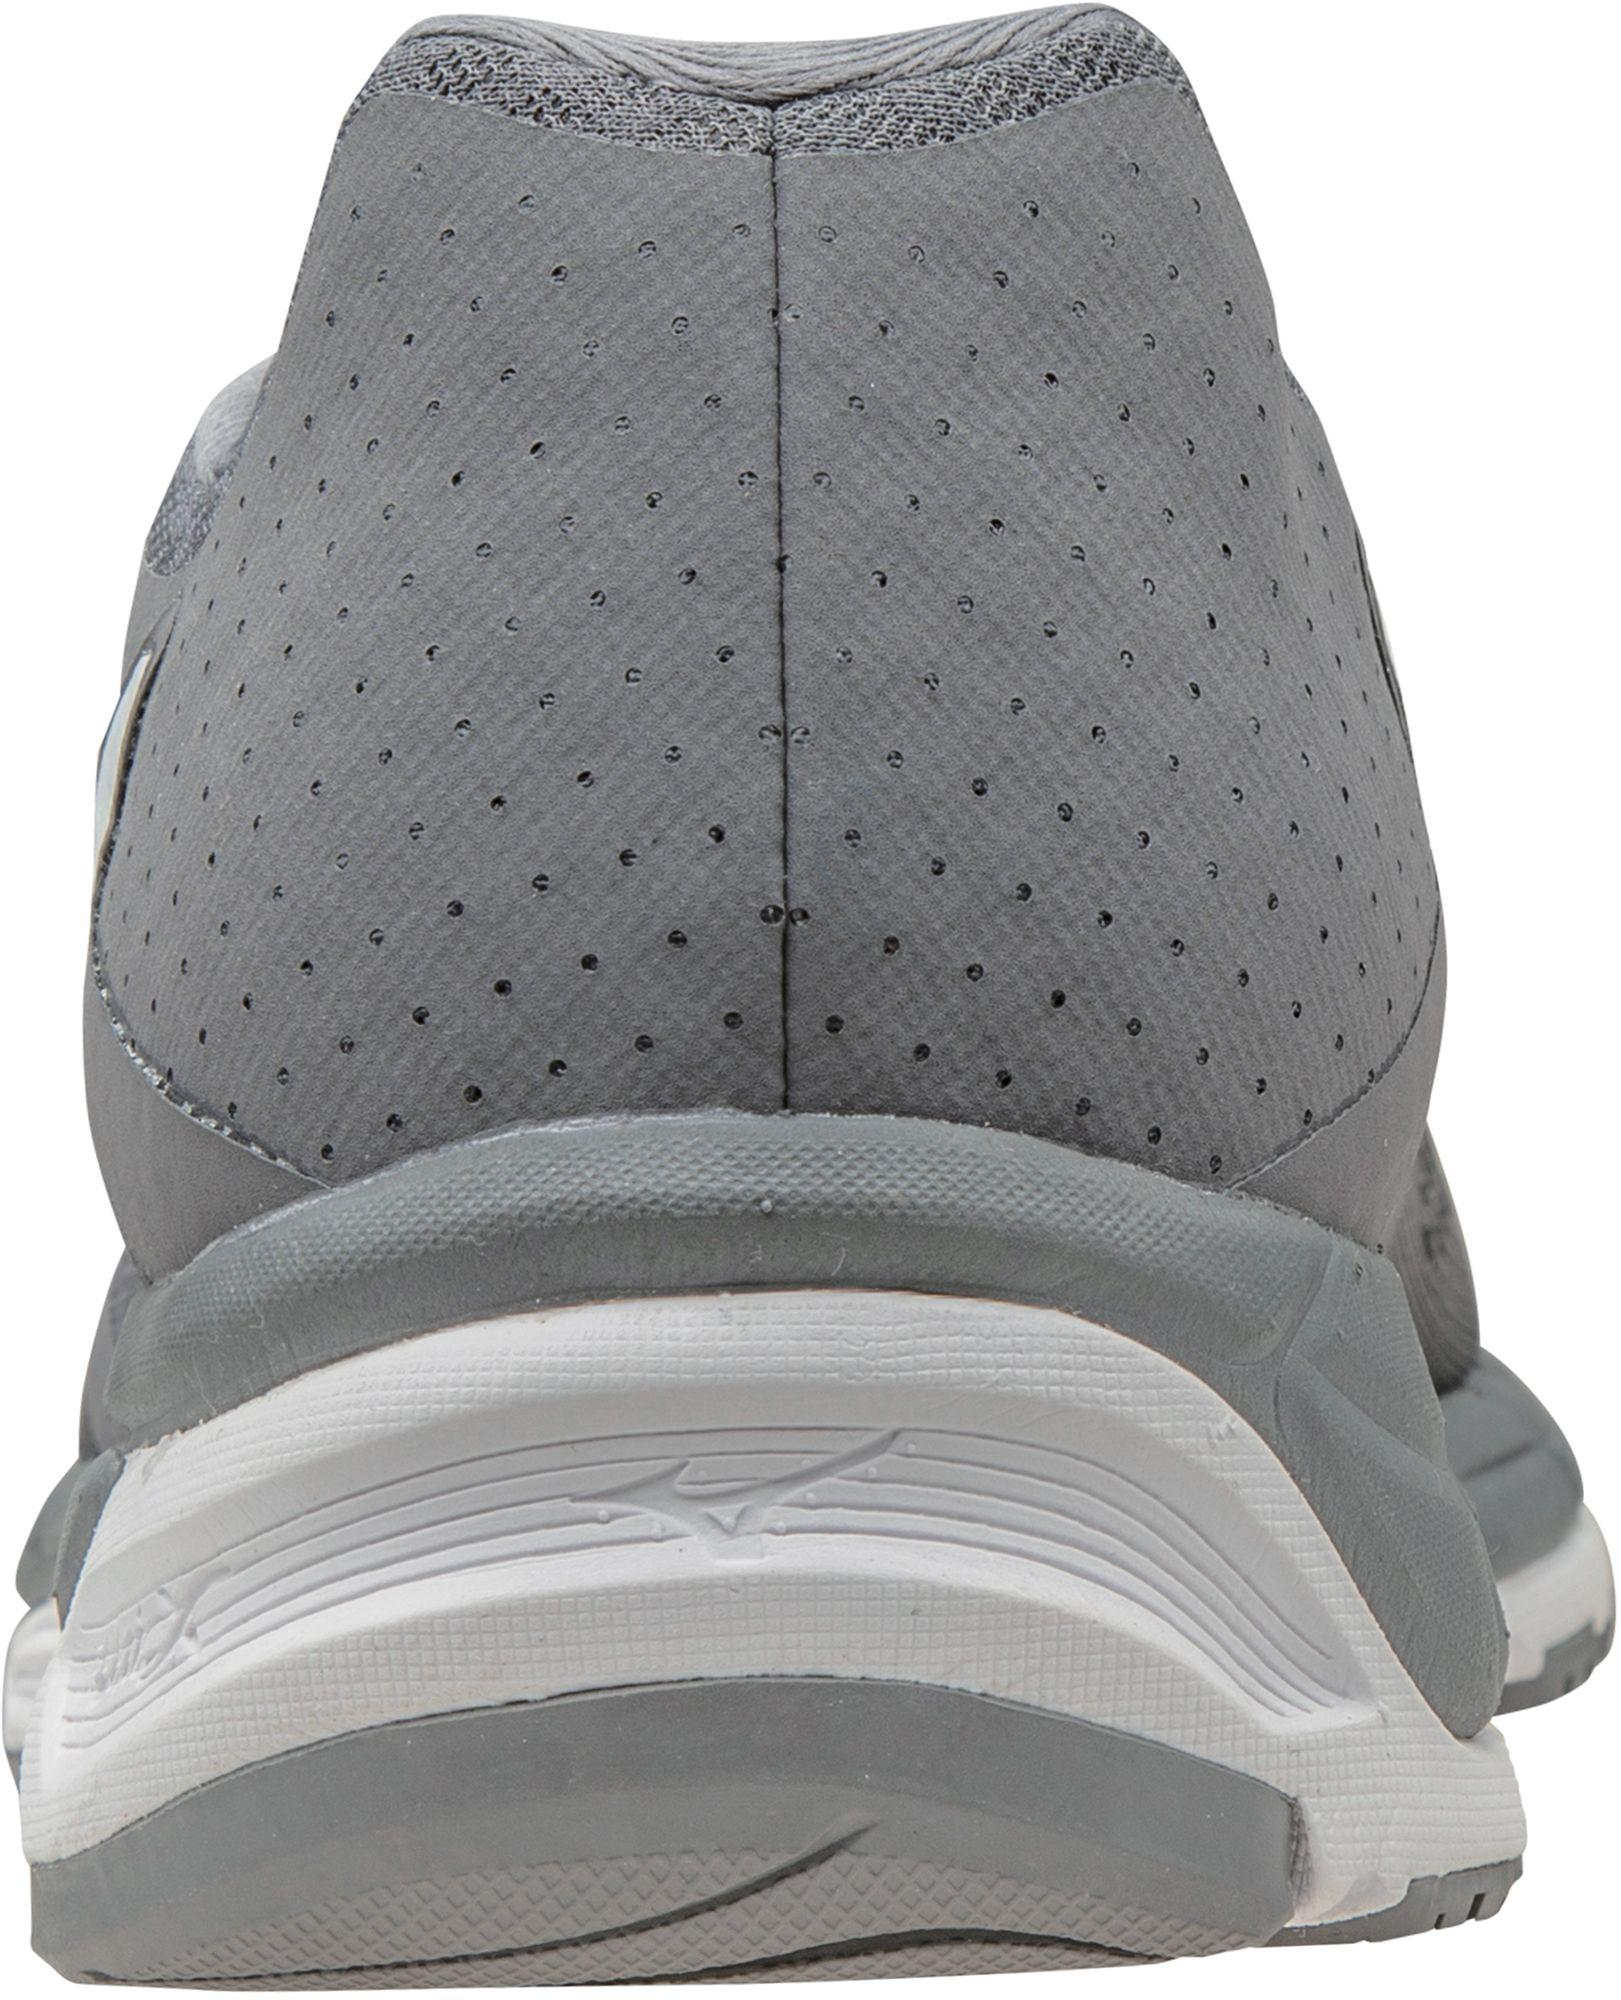 6ec91c07c24 Lyst - Mizuno Synchro Mx Trainer Baseball Shoes in Gray for Men